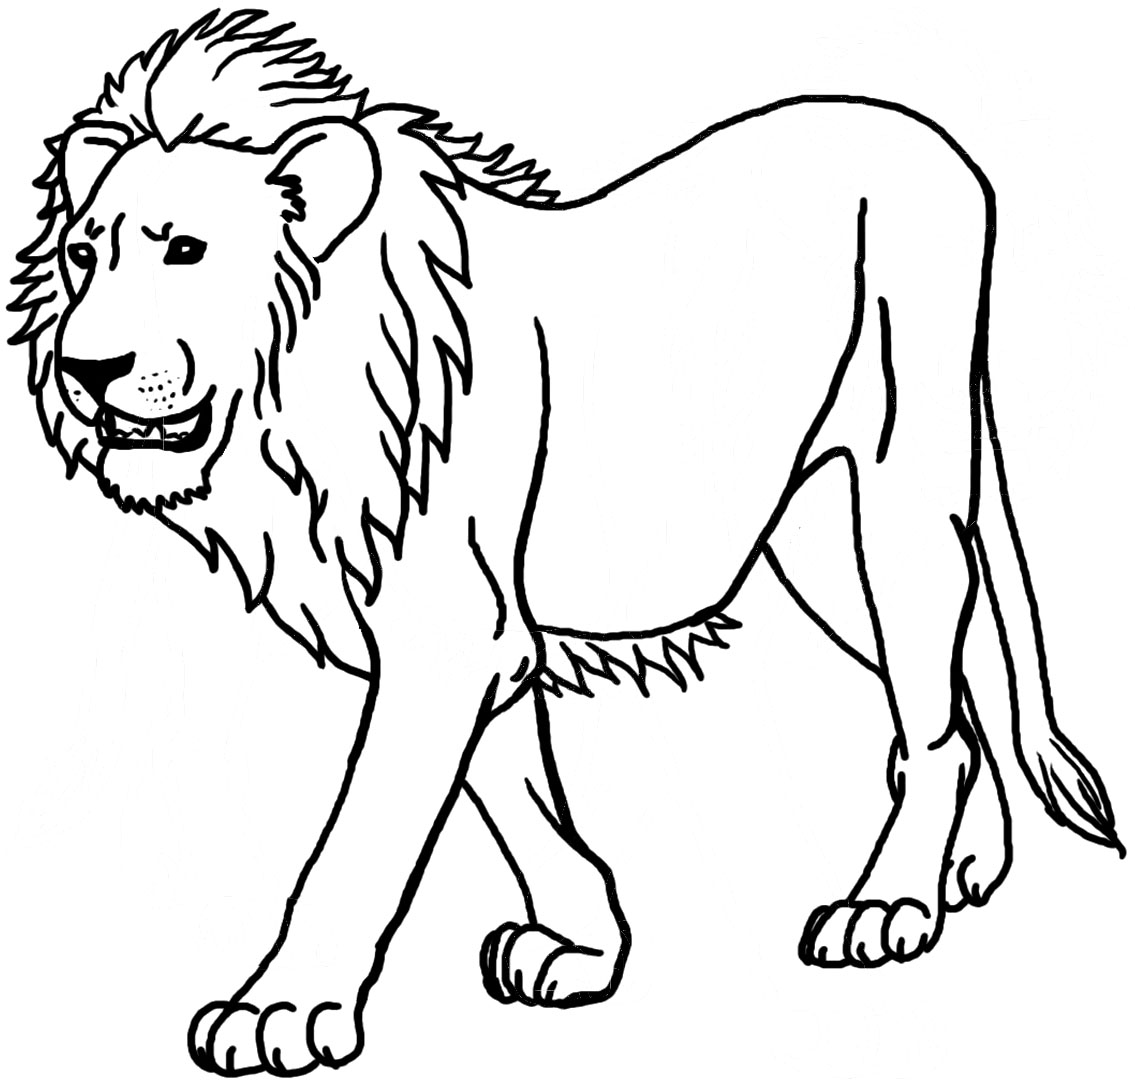 1135x1080 Free Printable Lion Clipart